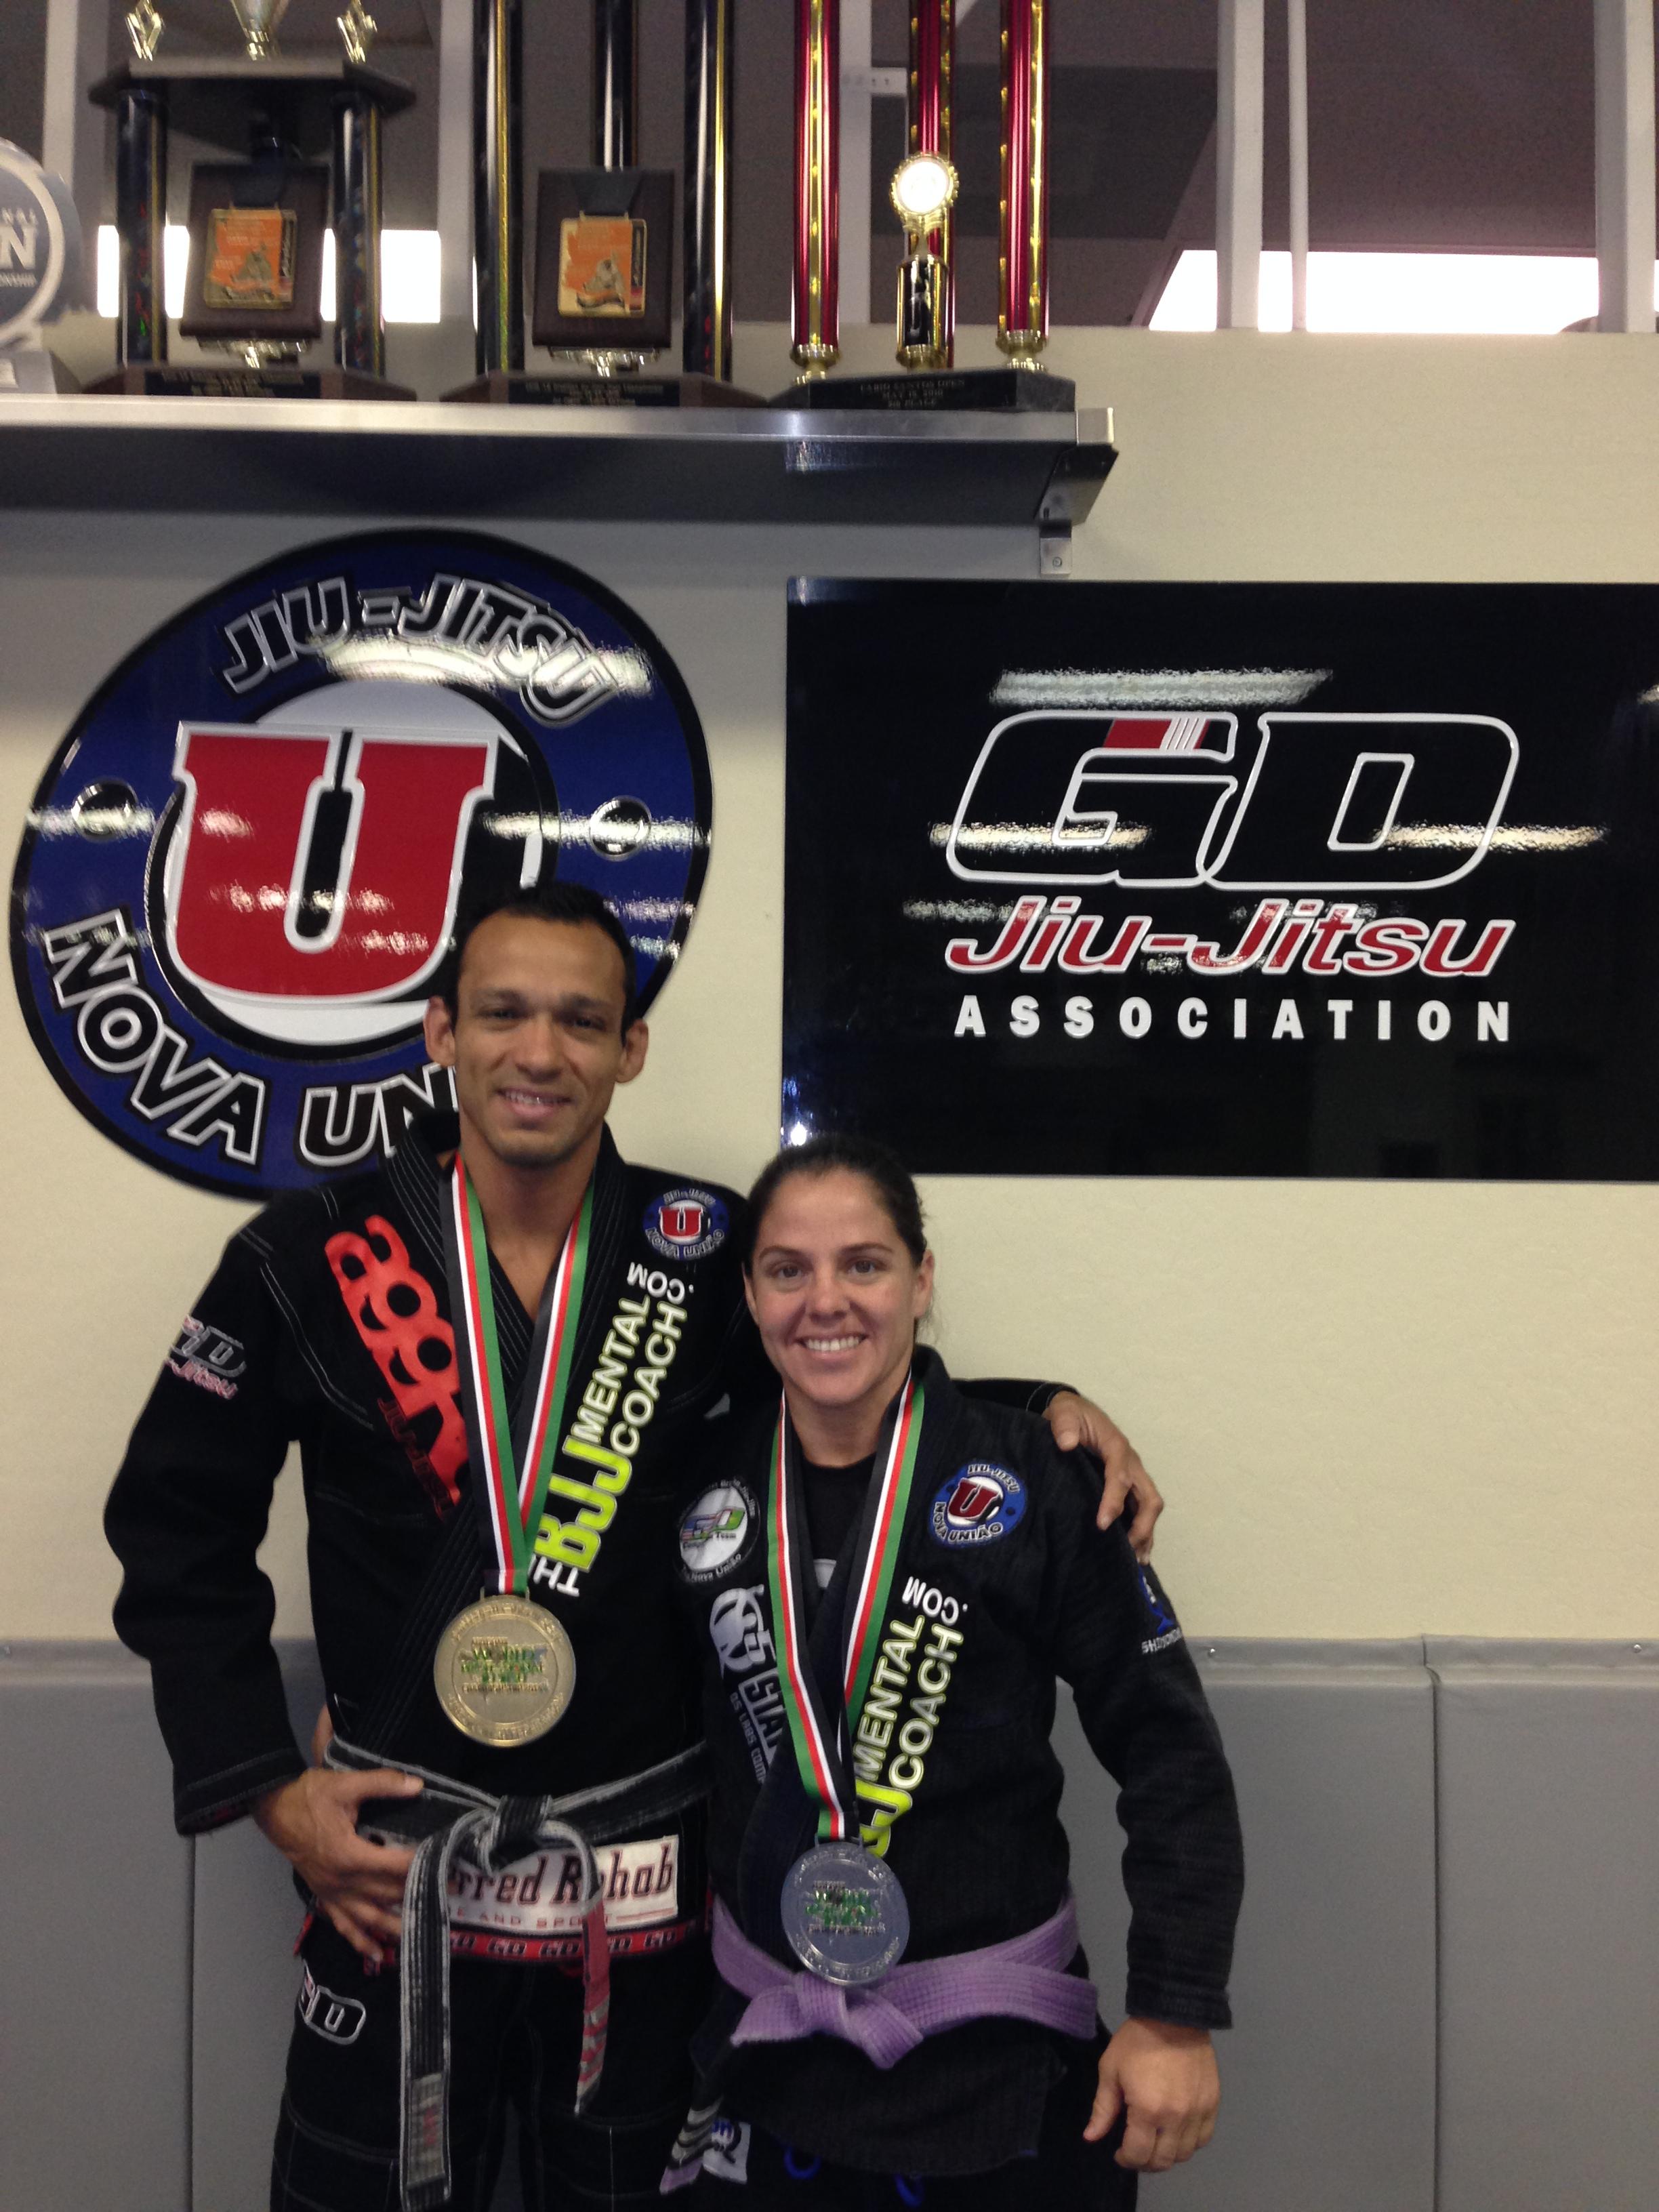 Gustavo Dantas with his student Sarah Black after the 2014 Abu Dhabi World Professional Jiu-Jitsu Championship. Photo: Personal Archive